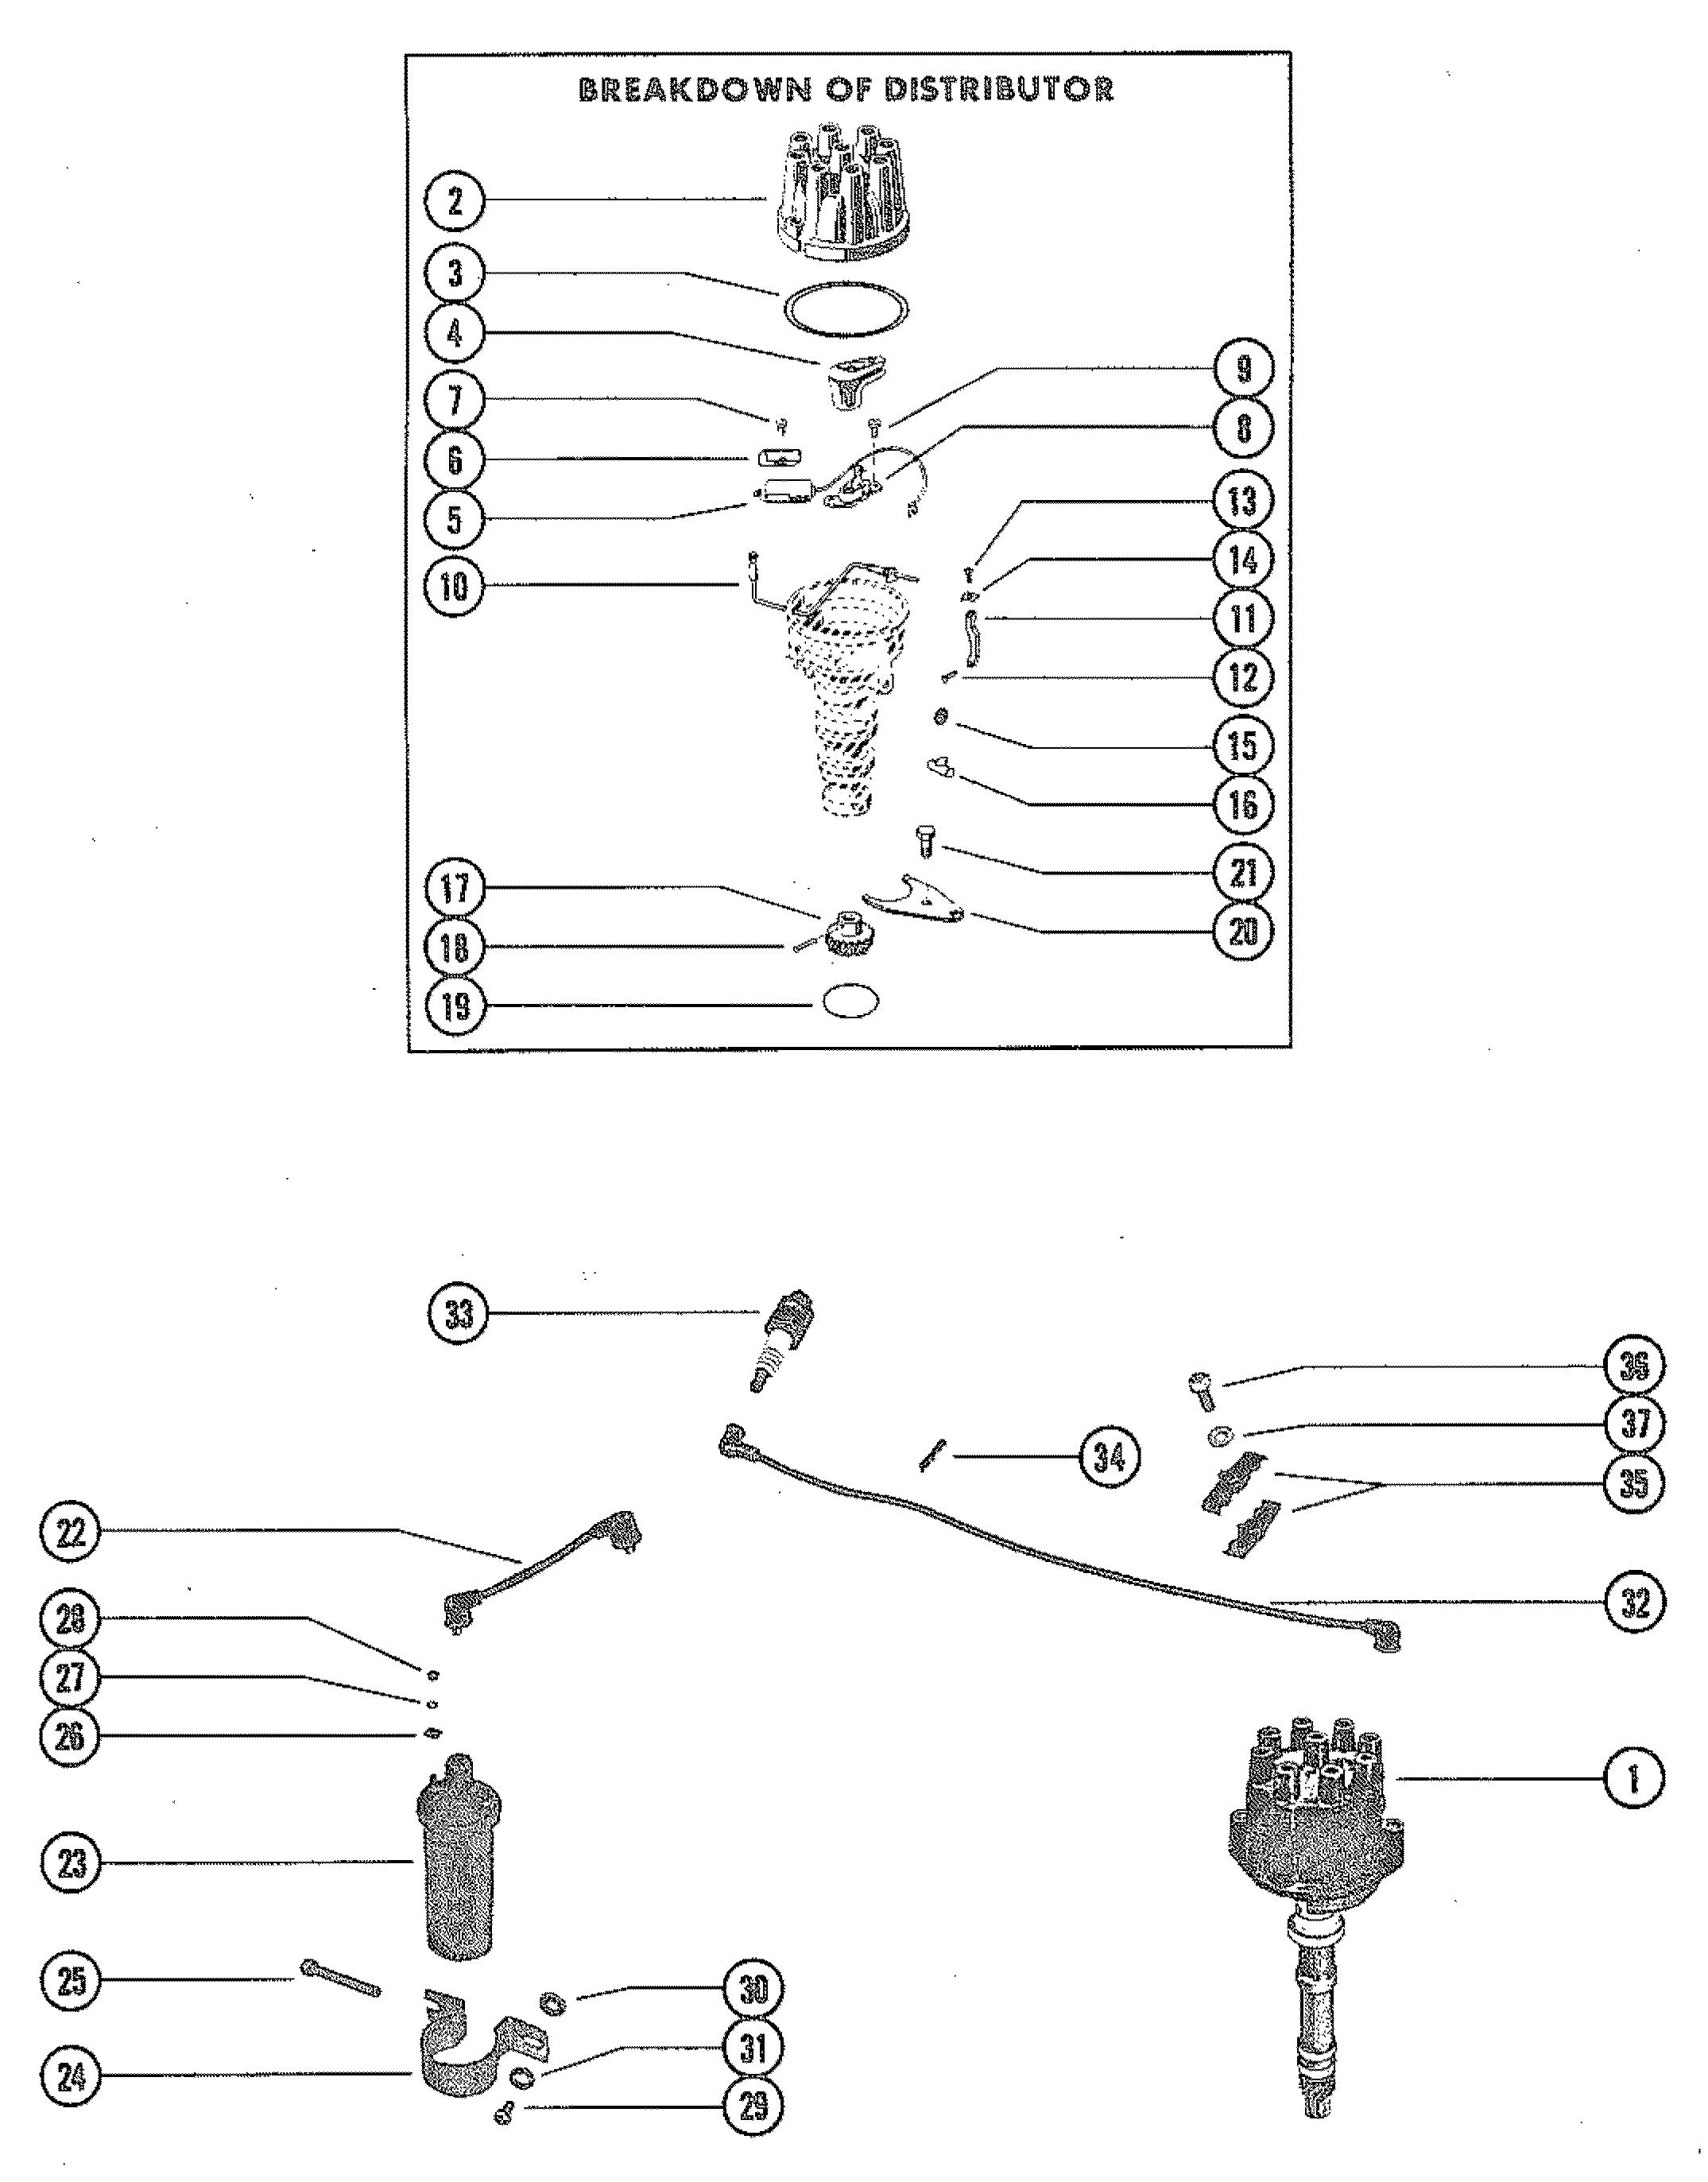 1976 Honda Cb550 Wiring Diagram